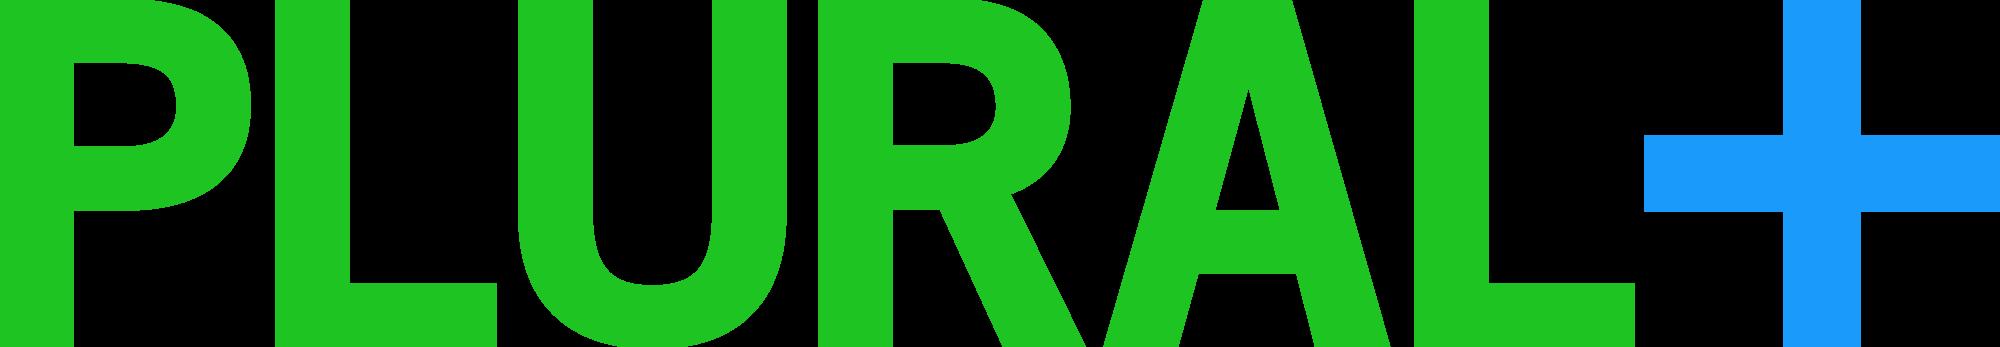 PLURAL+ Youth Video Festival Logo